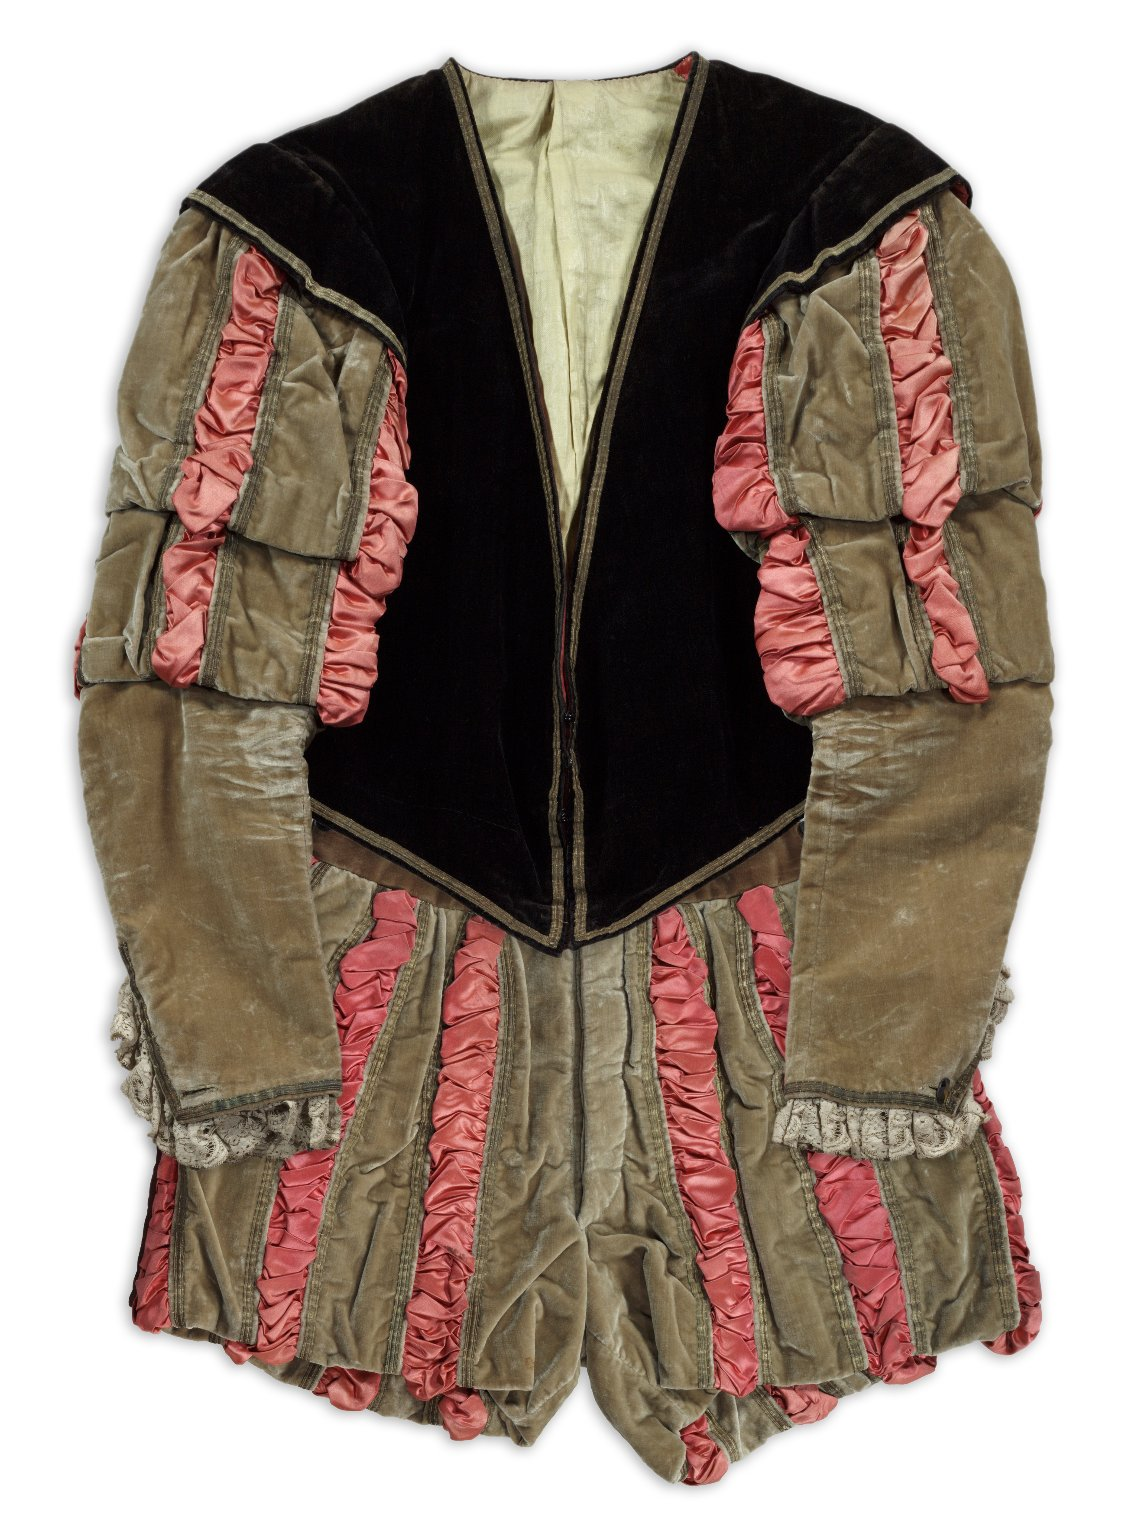 Edwin Booth costume for Iago